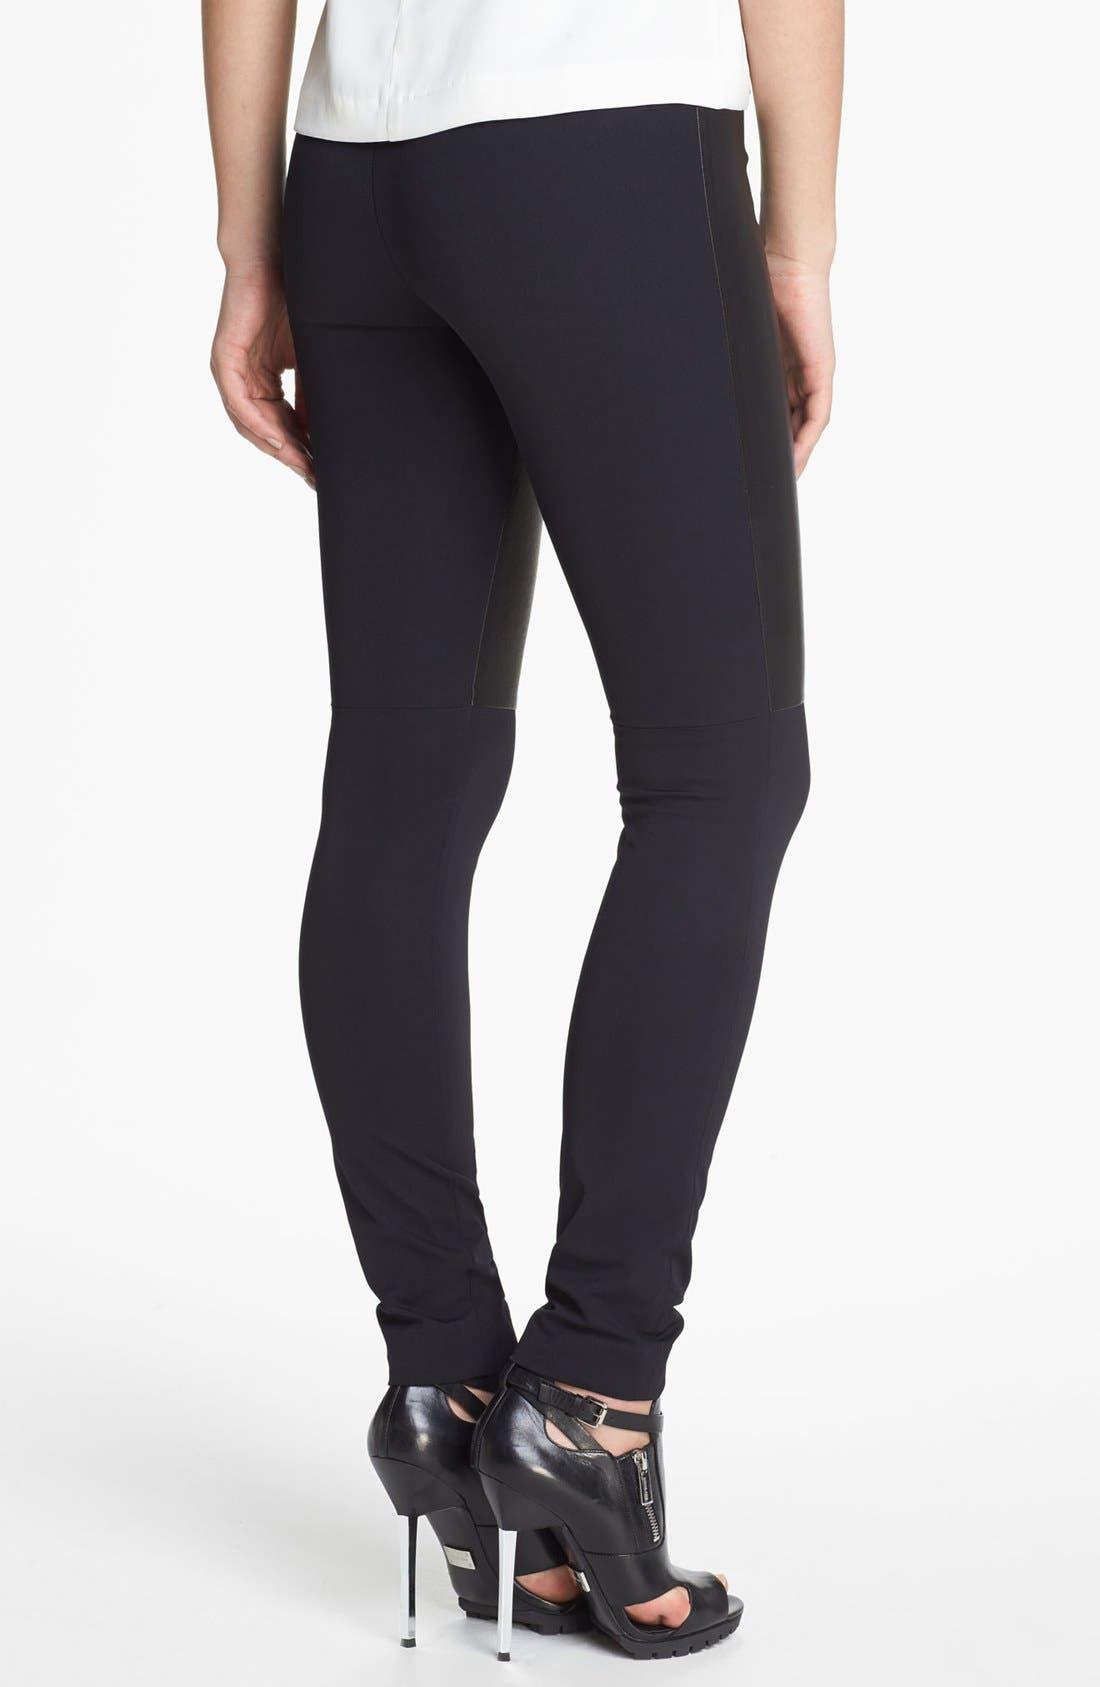 Alternate Image 2  - Milly 'Bri' Leather Panel Leggings